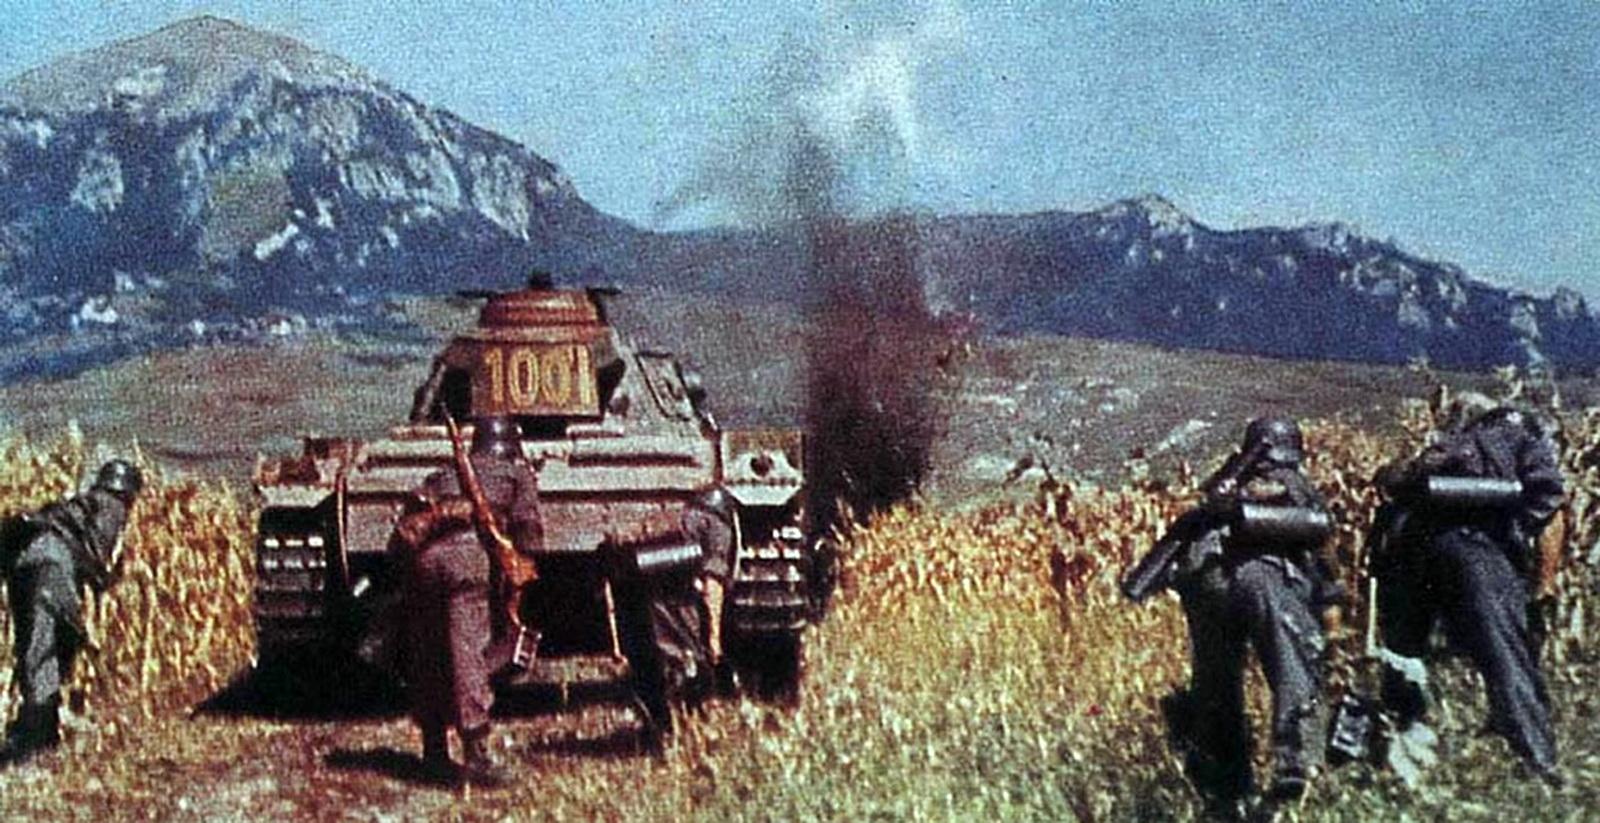 https://2.bp.blogspot.com/-4d_KUNdtc5I/UNEv1HYAQlI/AAAAAAAA5hA/82L2NVvqIsA/s1600/1st+Panzer+Army+Advances+on+the+Caucasus+Mountains.jpg